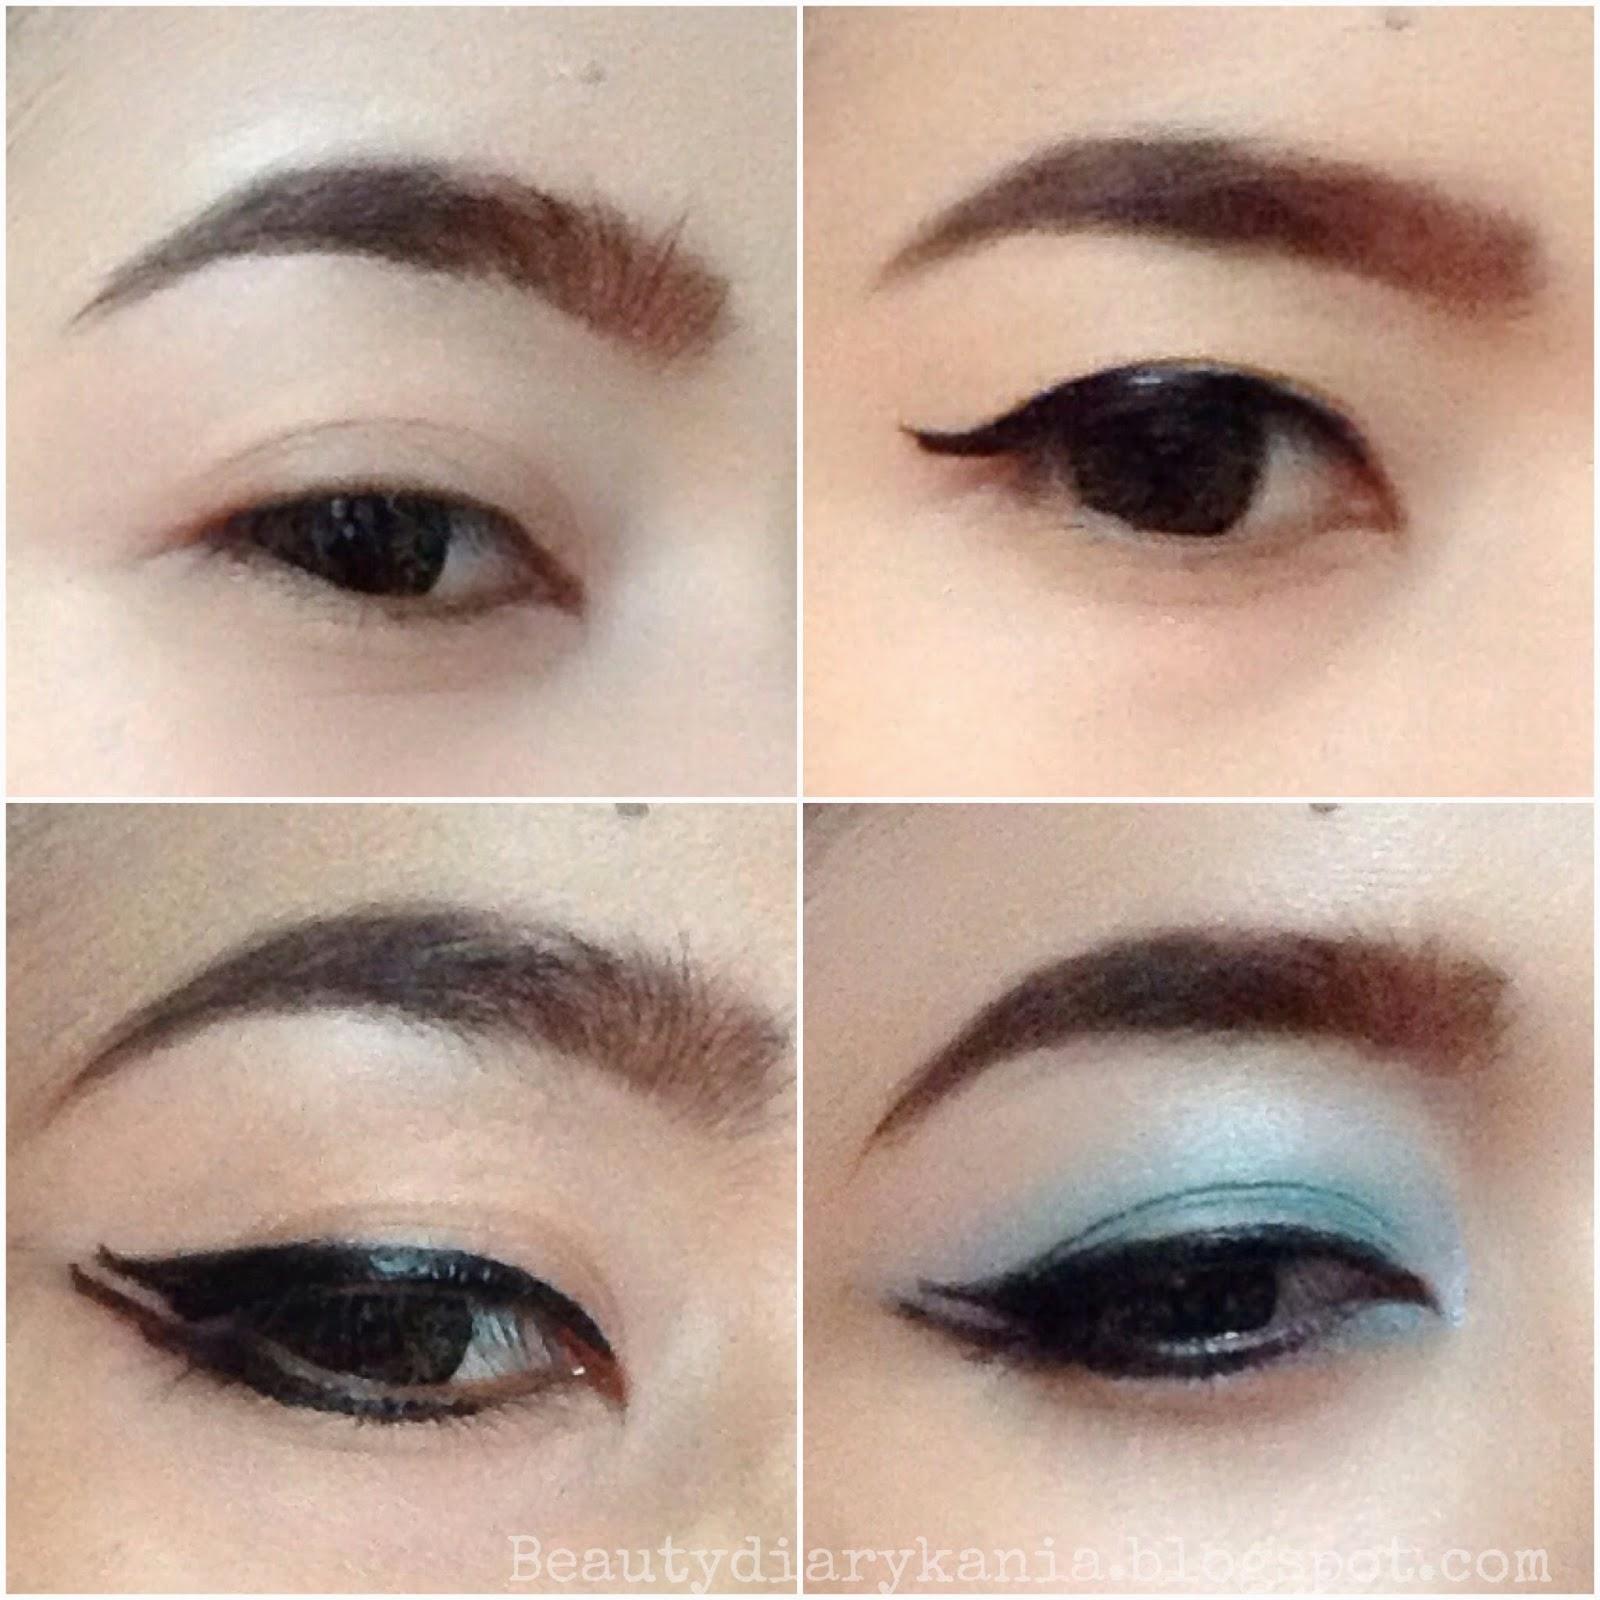 Beauty Diary Kania: Review Wardah Eye Expert Series ...